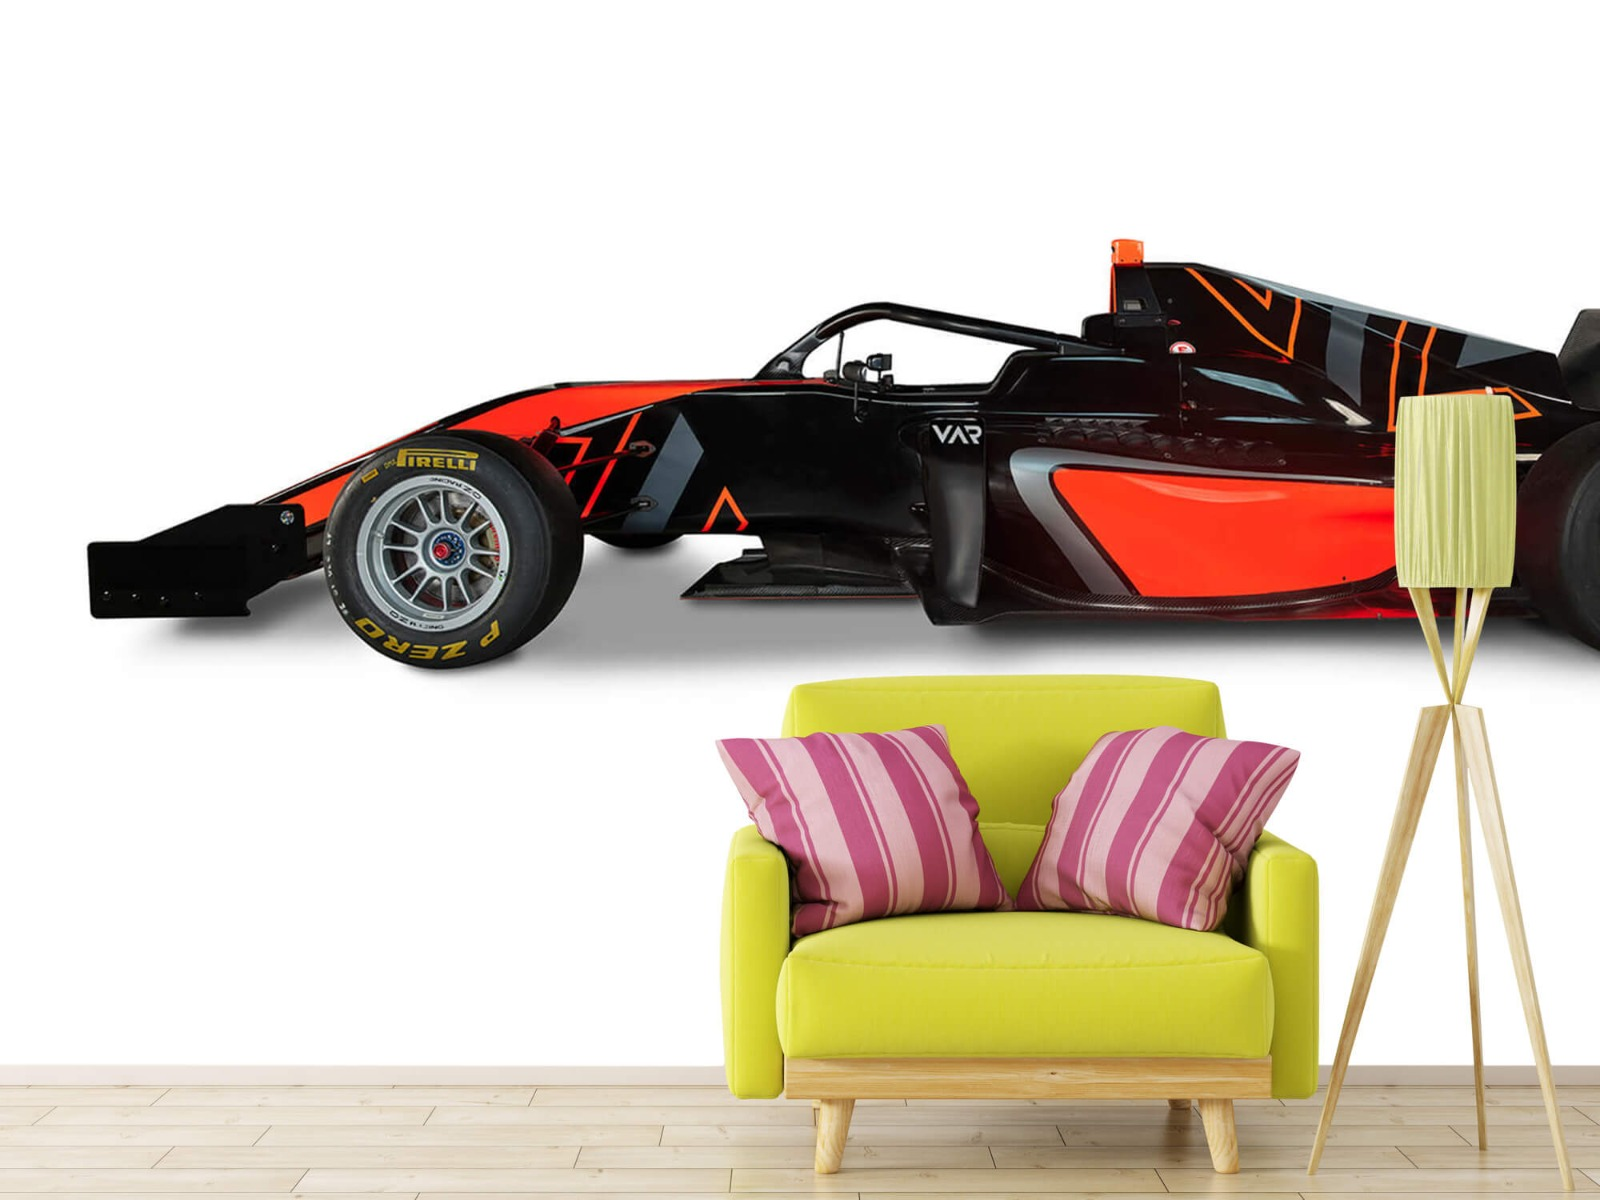 Sportauto's - Formule 3 - Lower side view - Computerruimte 17